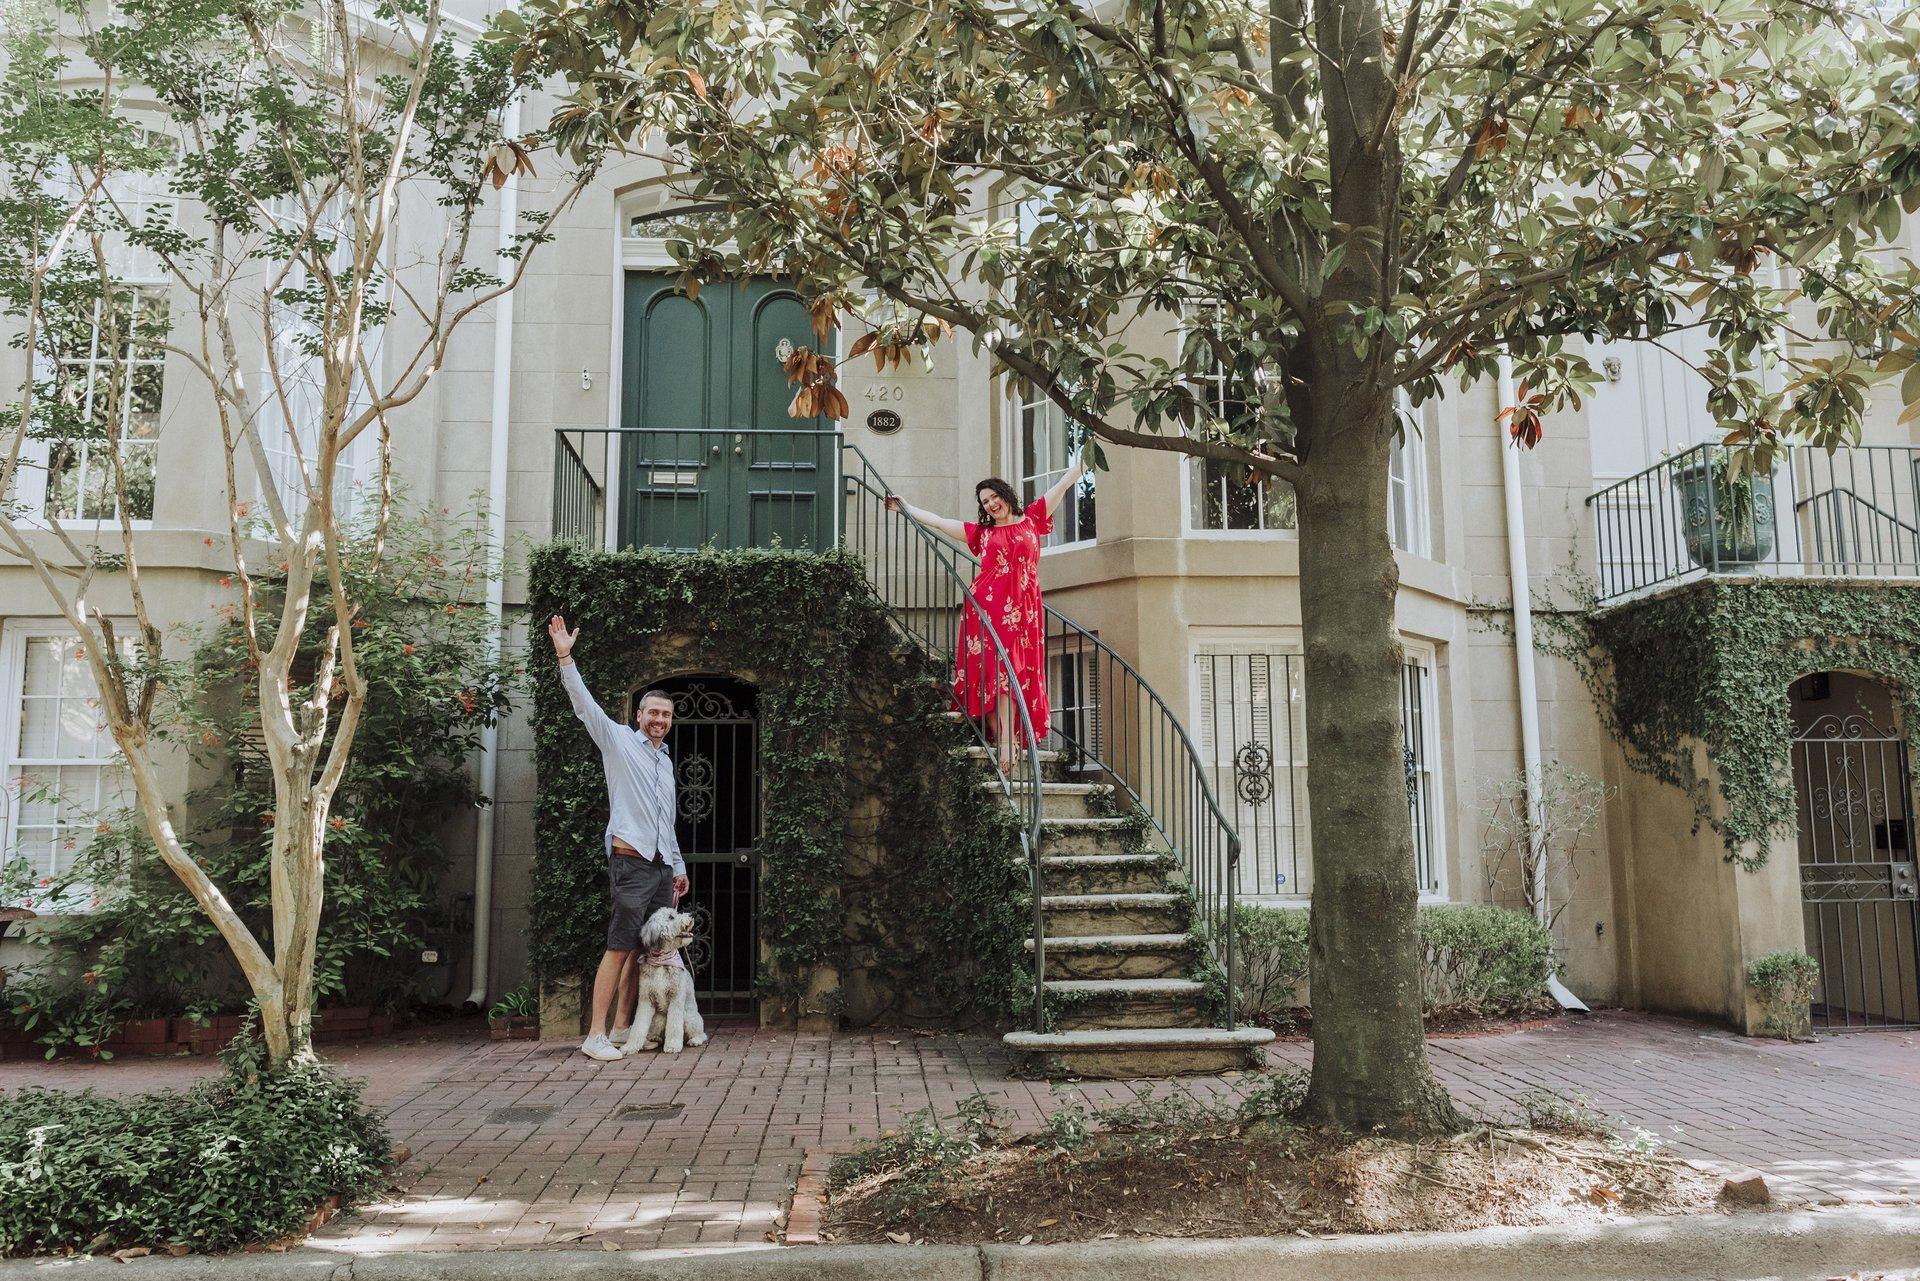 Savannah-United States-travel-story-Flytographer-31